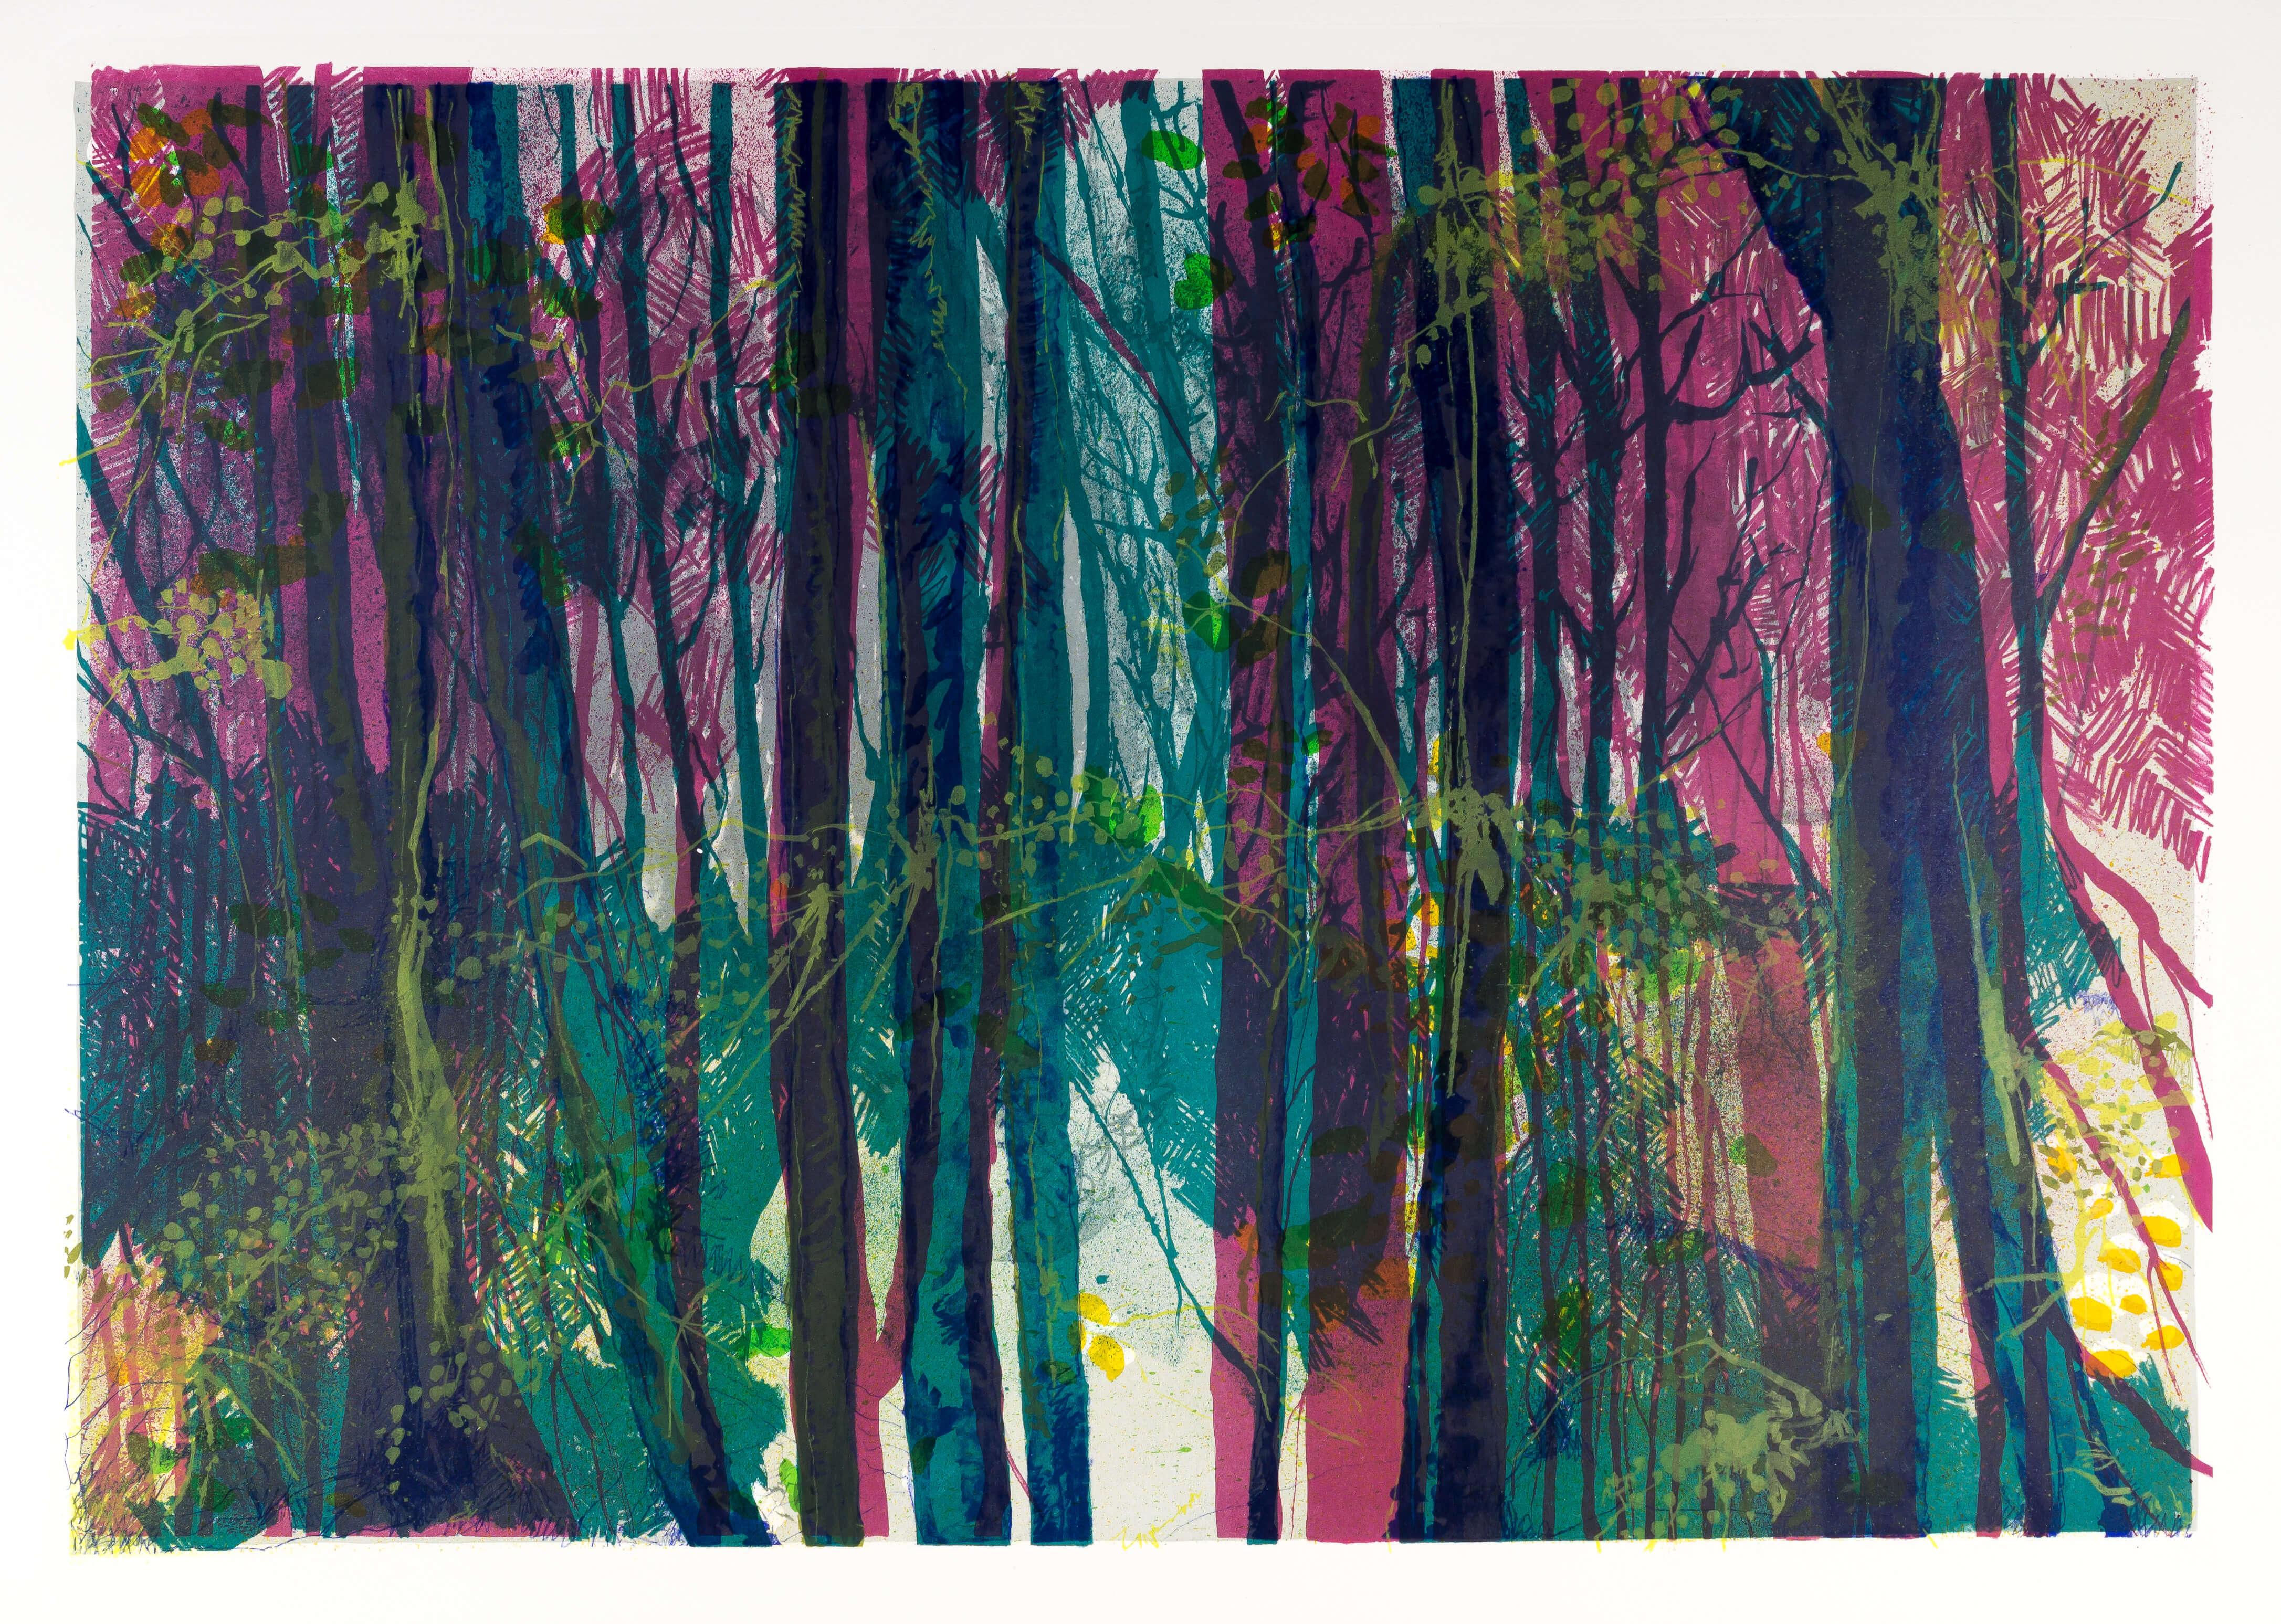 Katharina Albers, Wald XVI, 2014, Farblithographie, Unikat, 64×92 cm